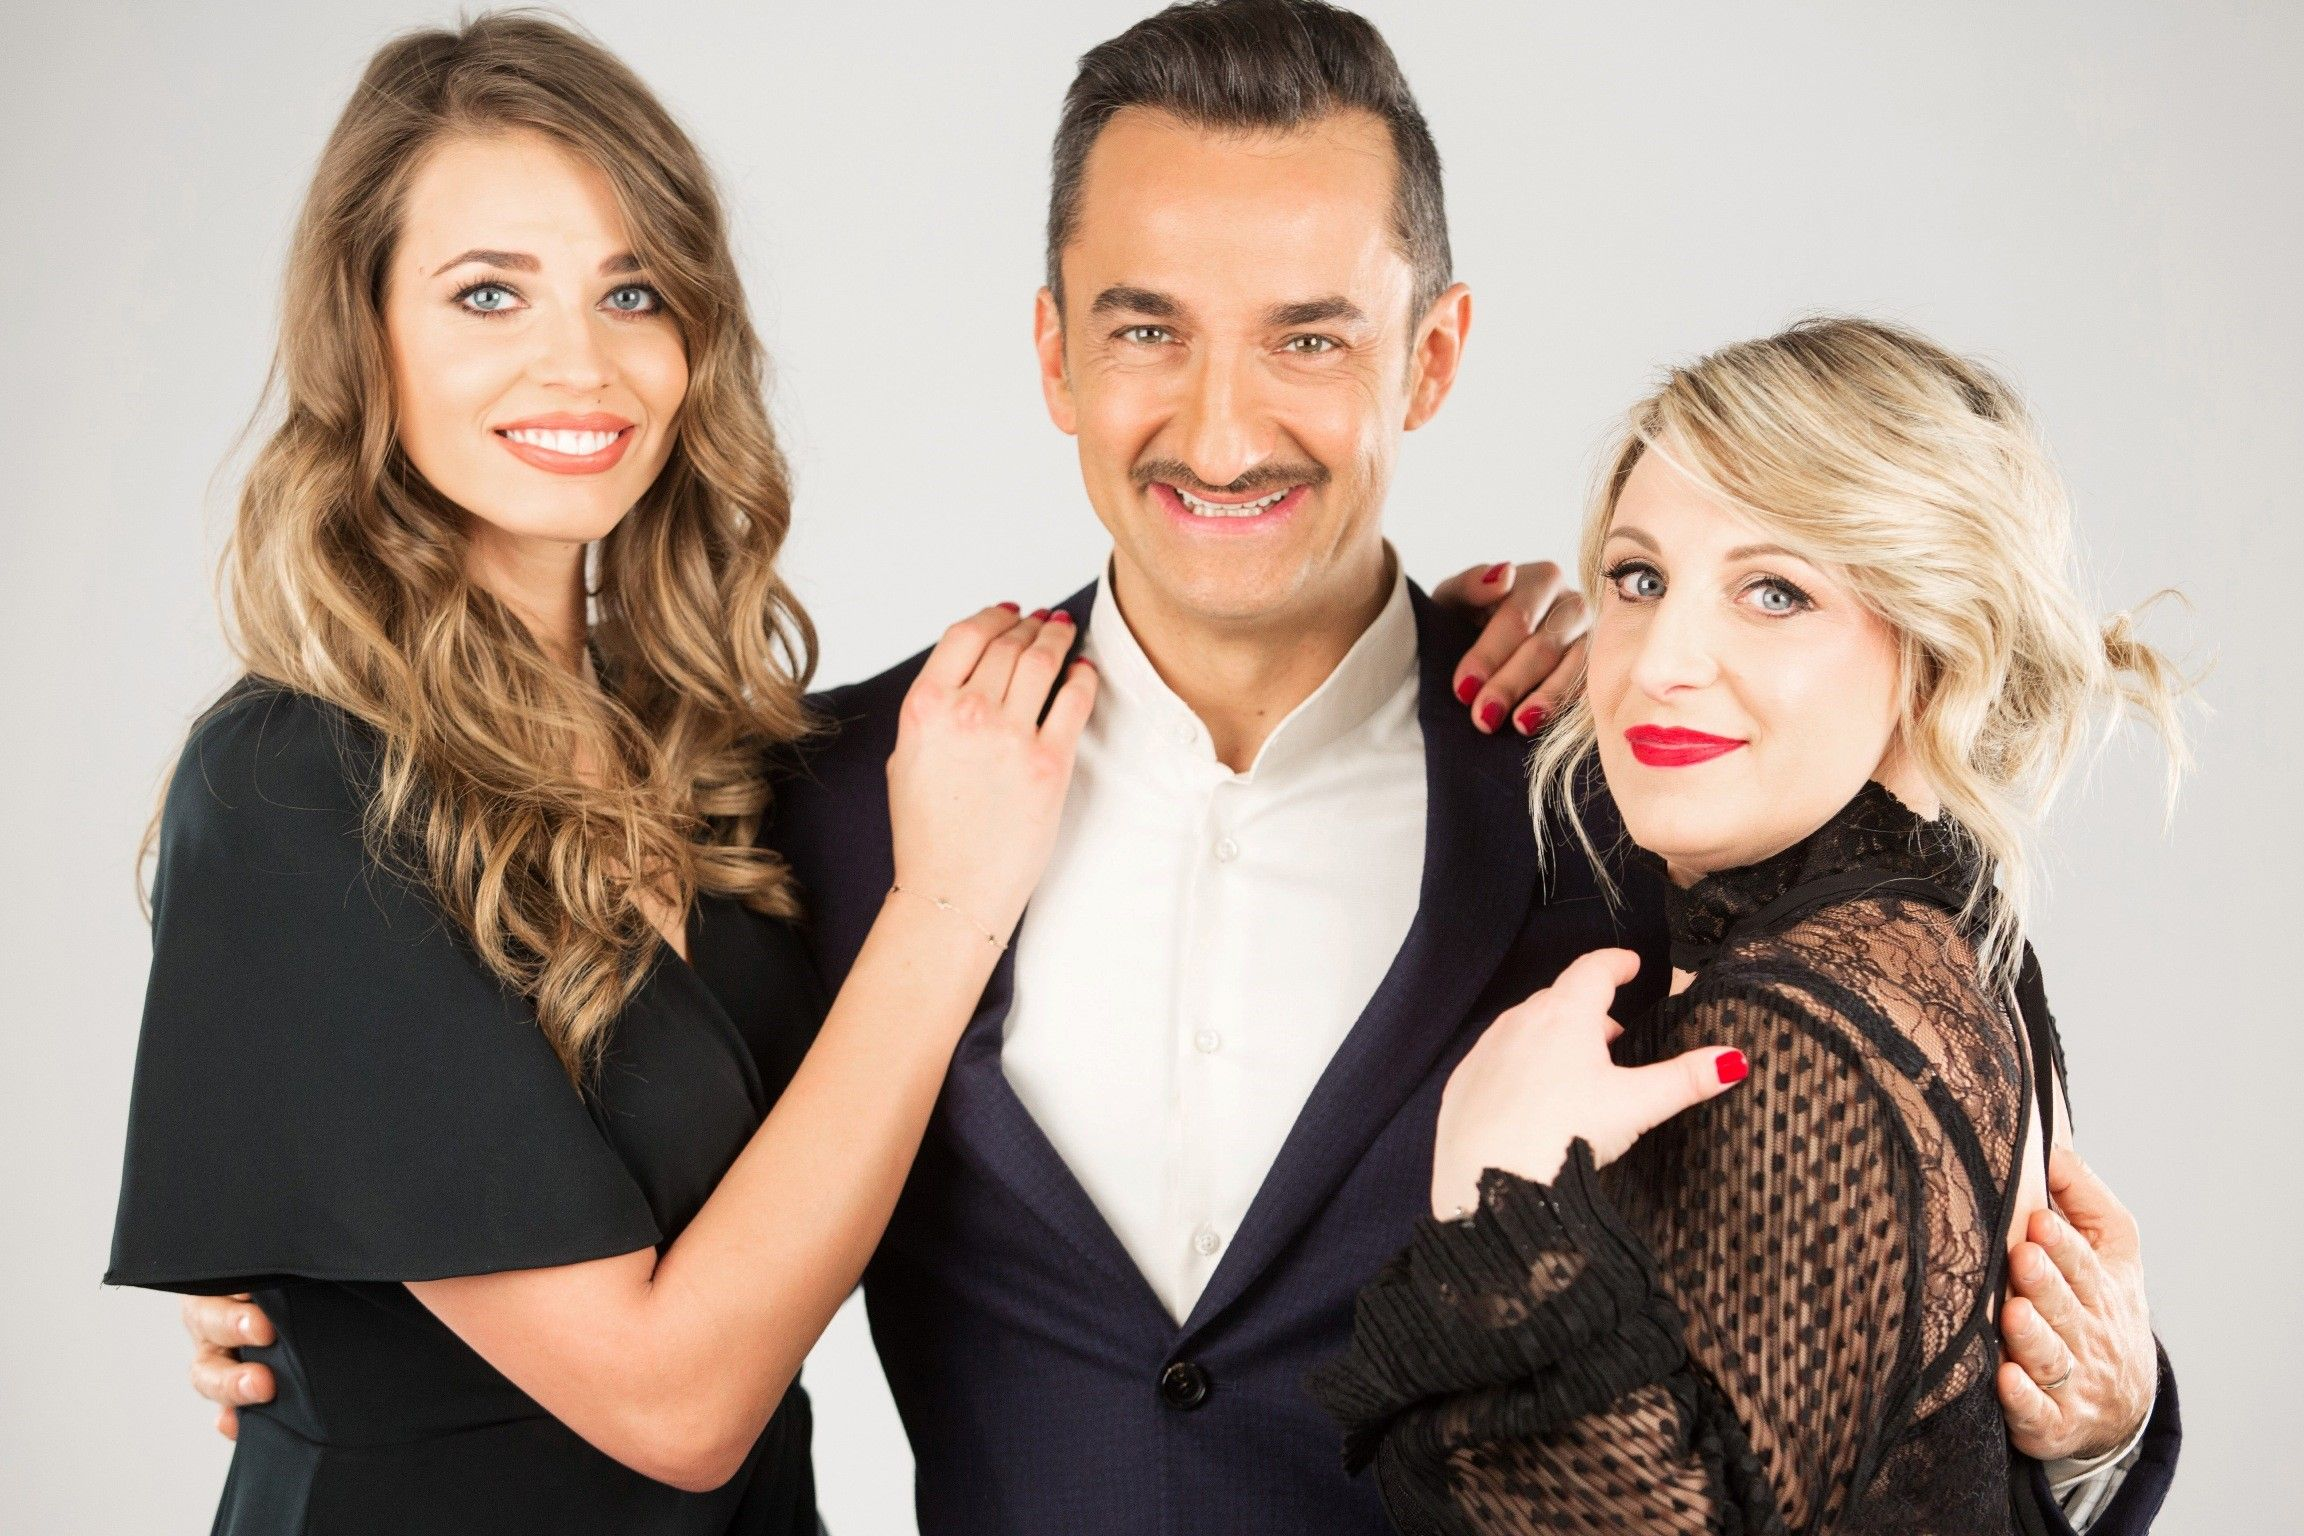 90 Special su Italia 1 dal 17 gennaio 2018: conduttori Nicola Savino, Katia Follesa e Ivana Mrazova